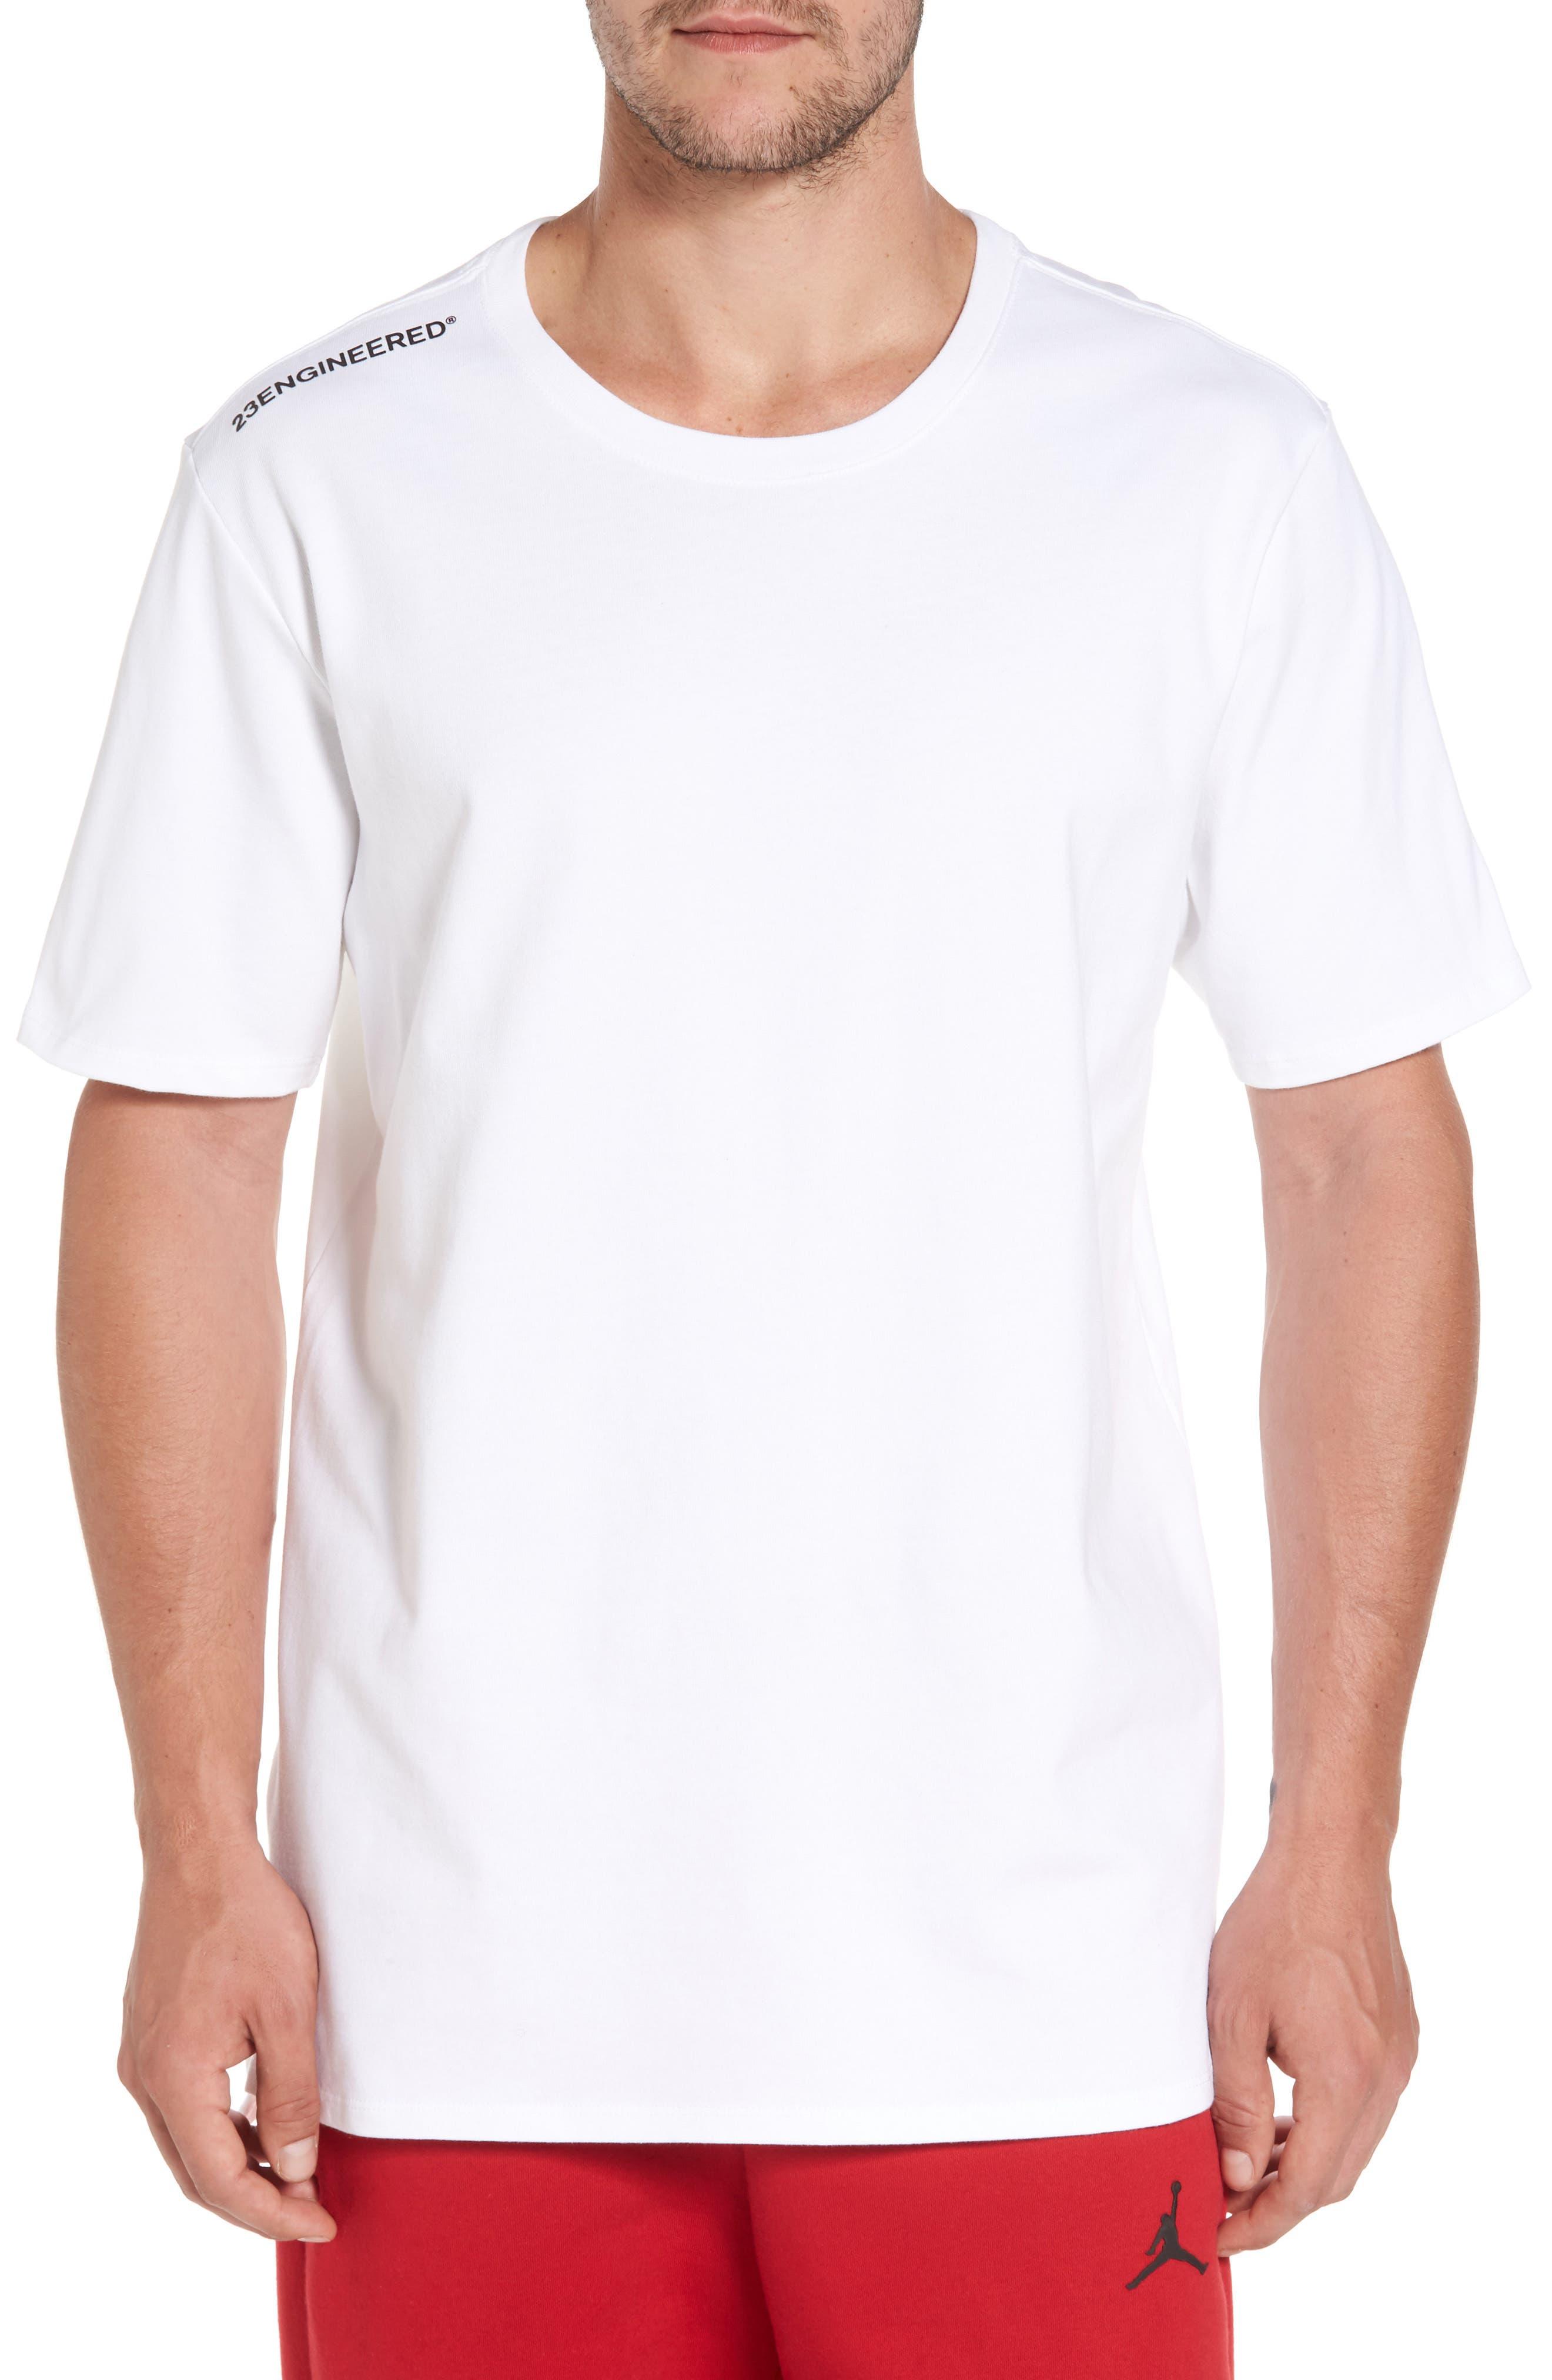 Sportswear 23 Engineered T-Shirt,                             Main thumbnail 1, color,                             White/ Black